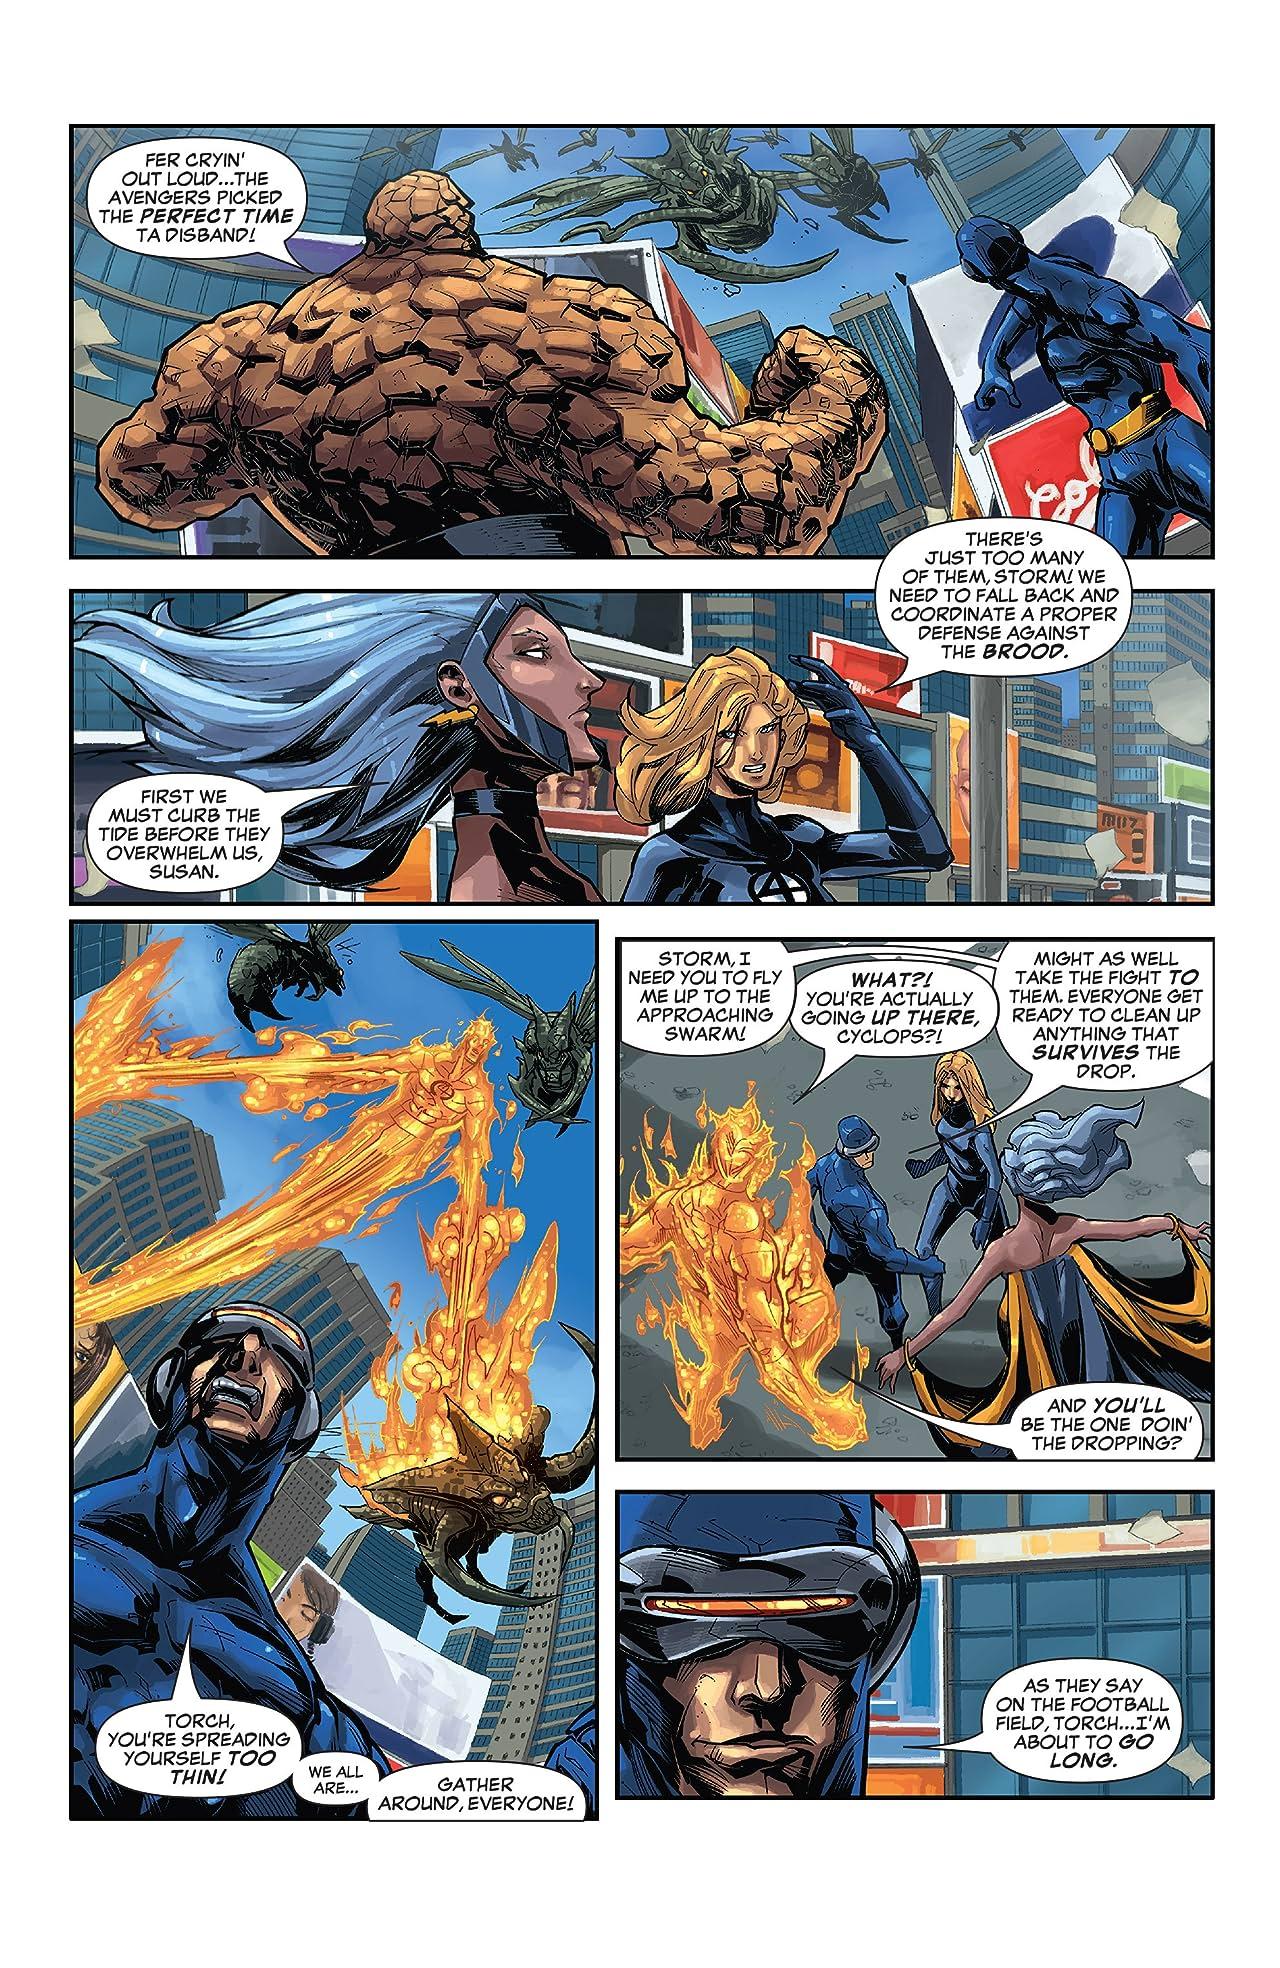 X-Men / Fantastic Four (2005) #5 (of 5)